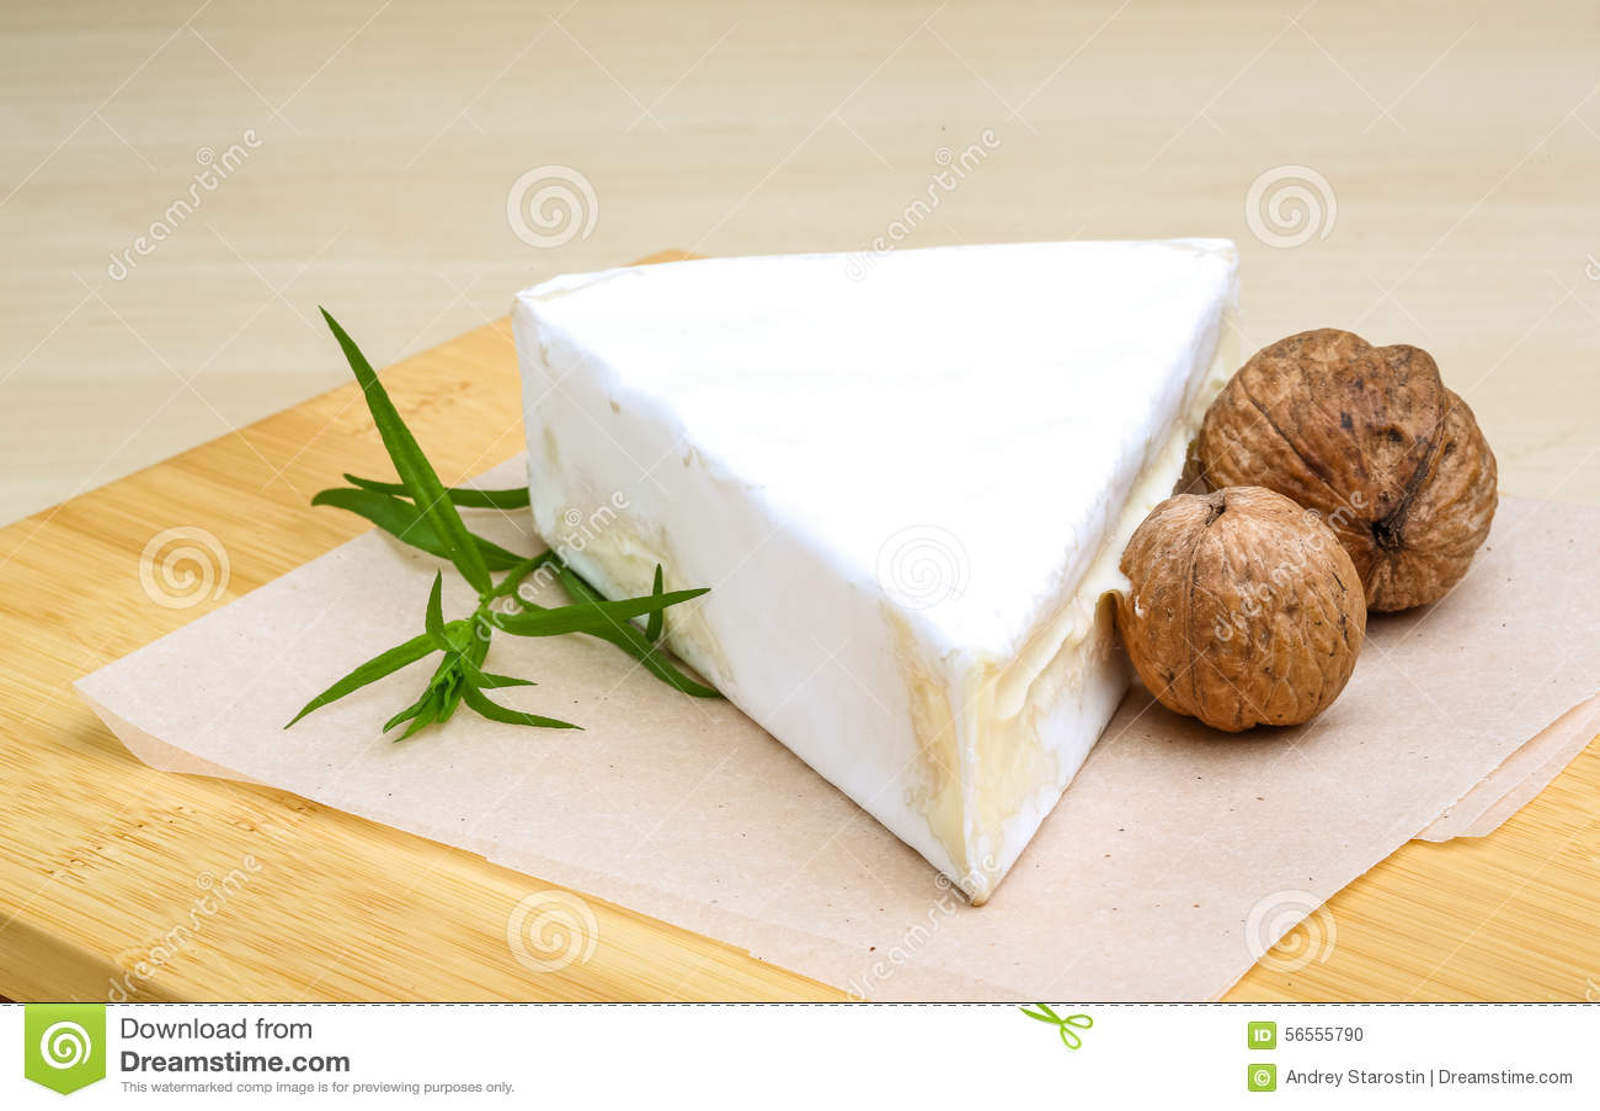 Download Τυρί της Brie στοκ εικόνες. εικόνα από διακοπής, ορέξεων - 56555790